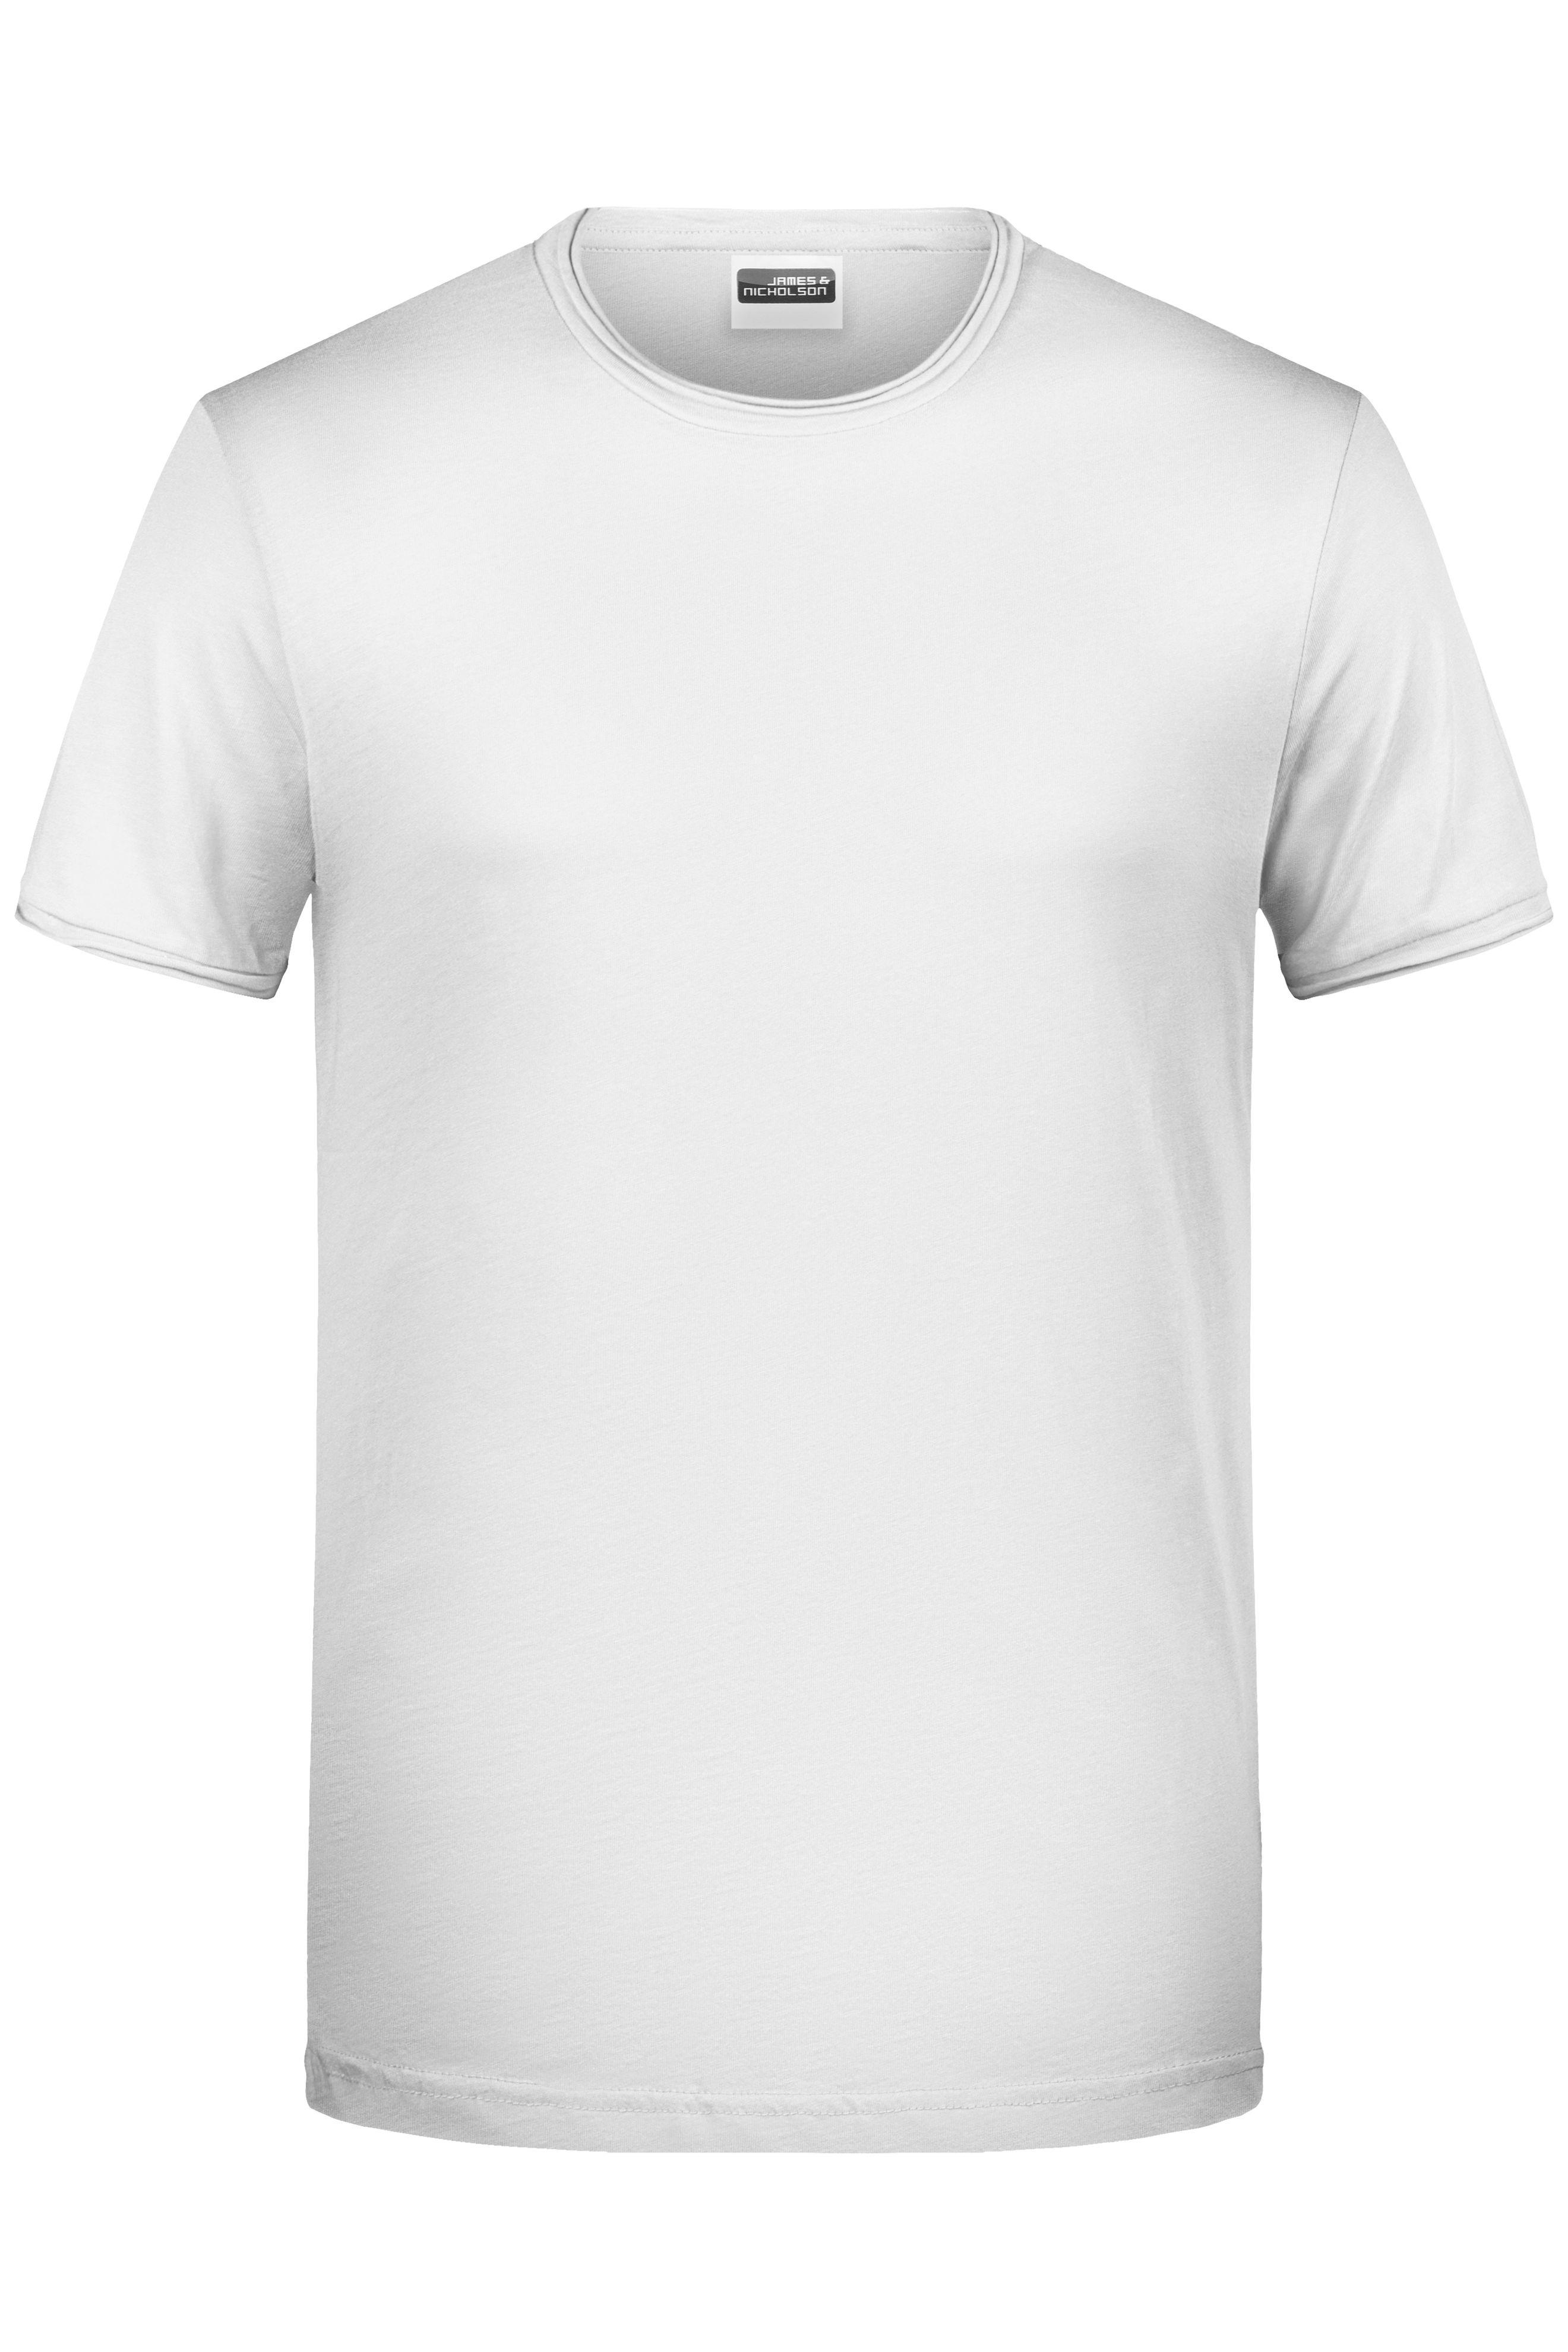 Herren T-Shirt mit trendigem Rollsaum